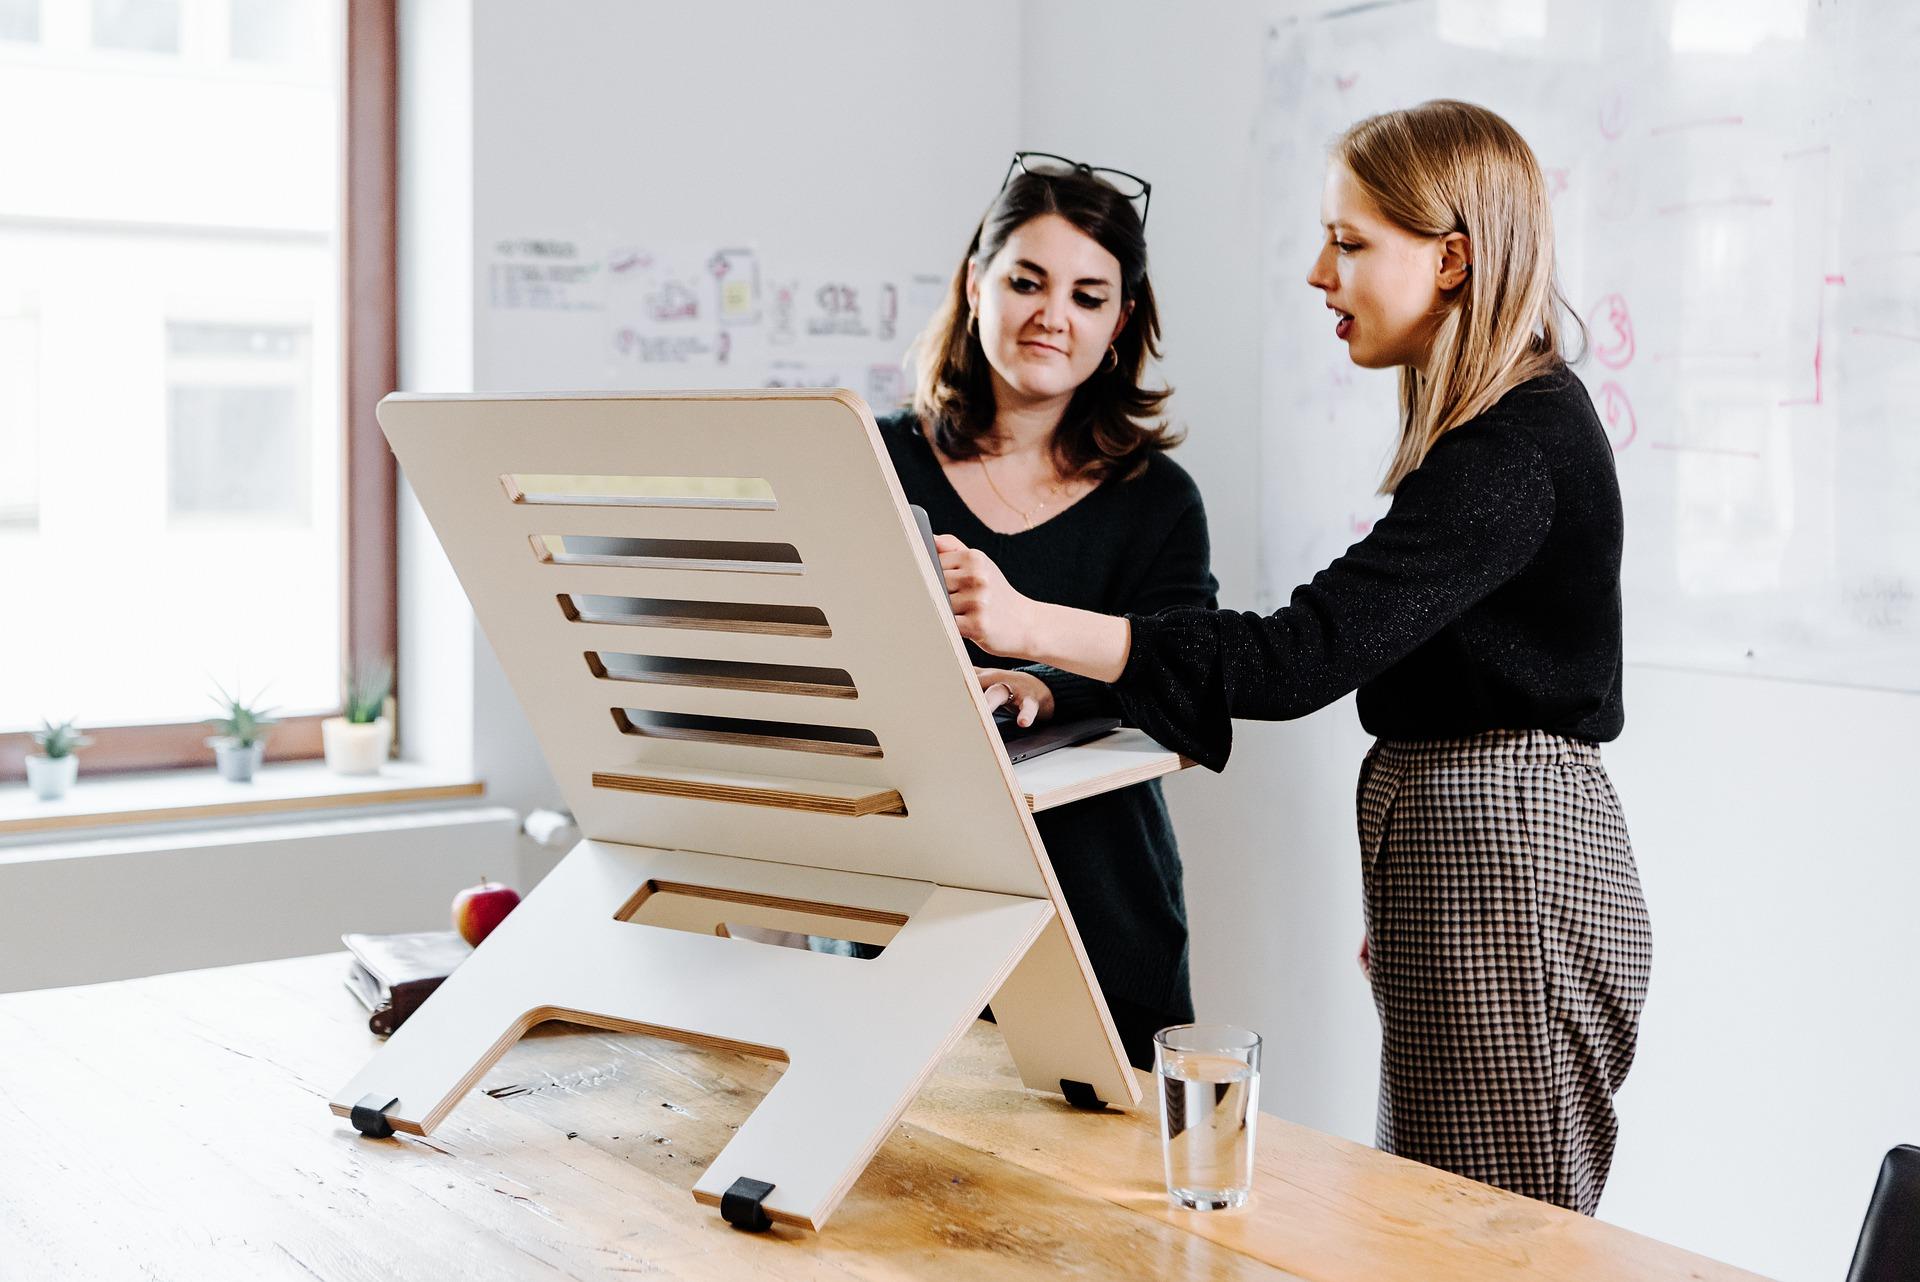 Ergonomic Benefits of Standing Desk